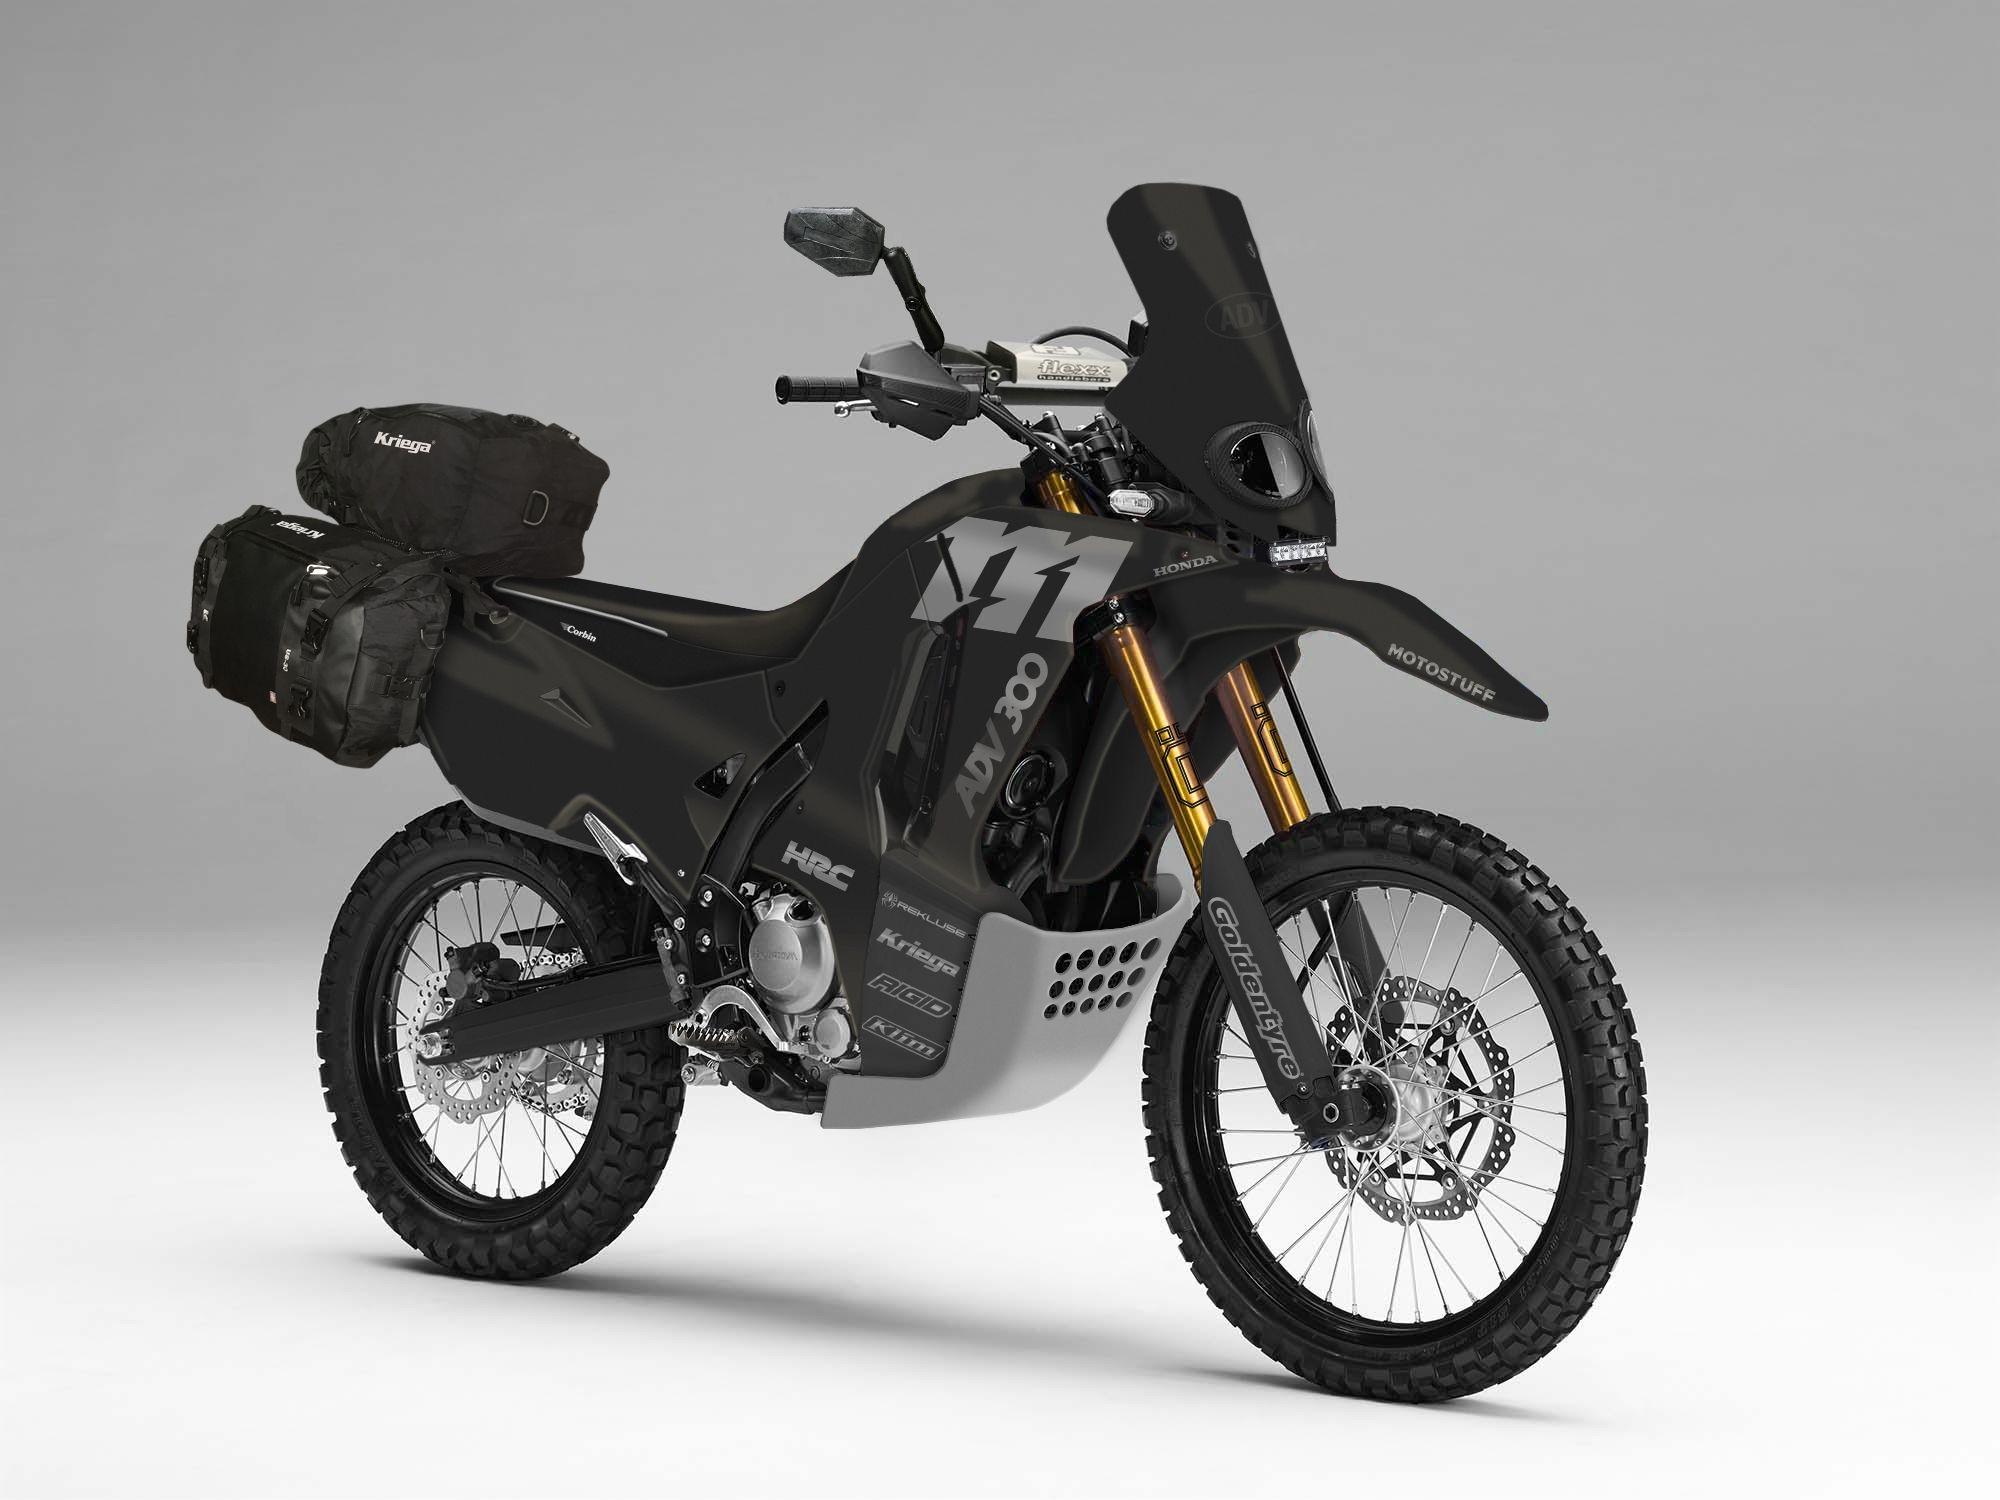 Honda Crf250l Rally Adv Black Honda Motorcycle